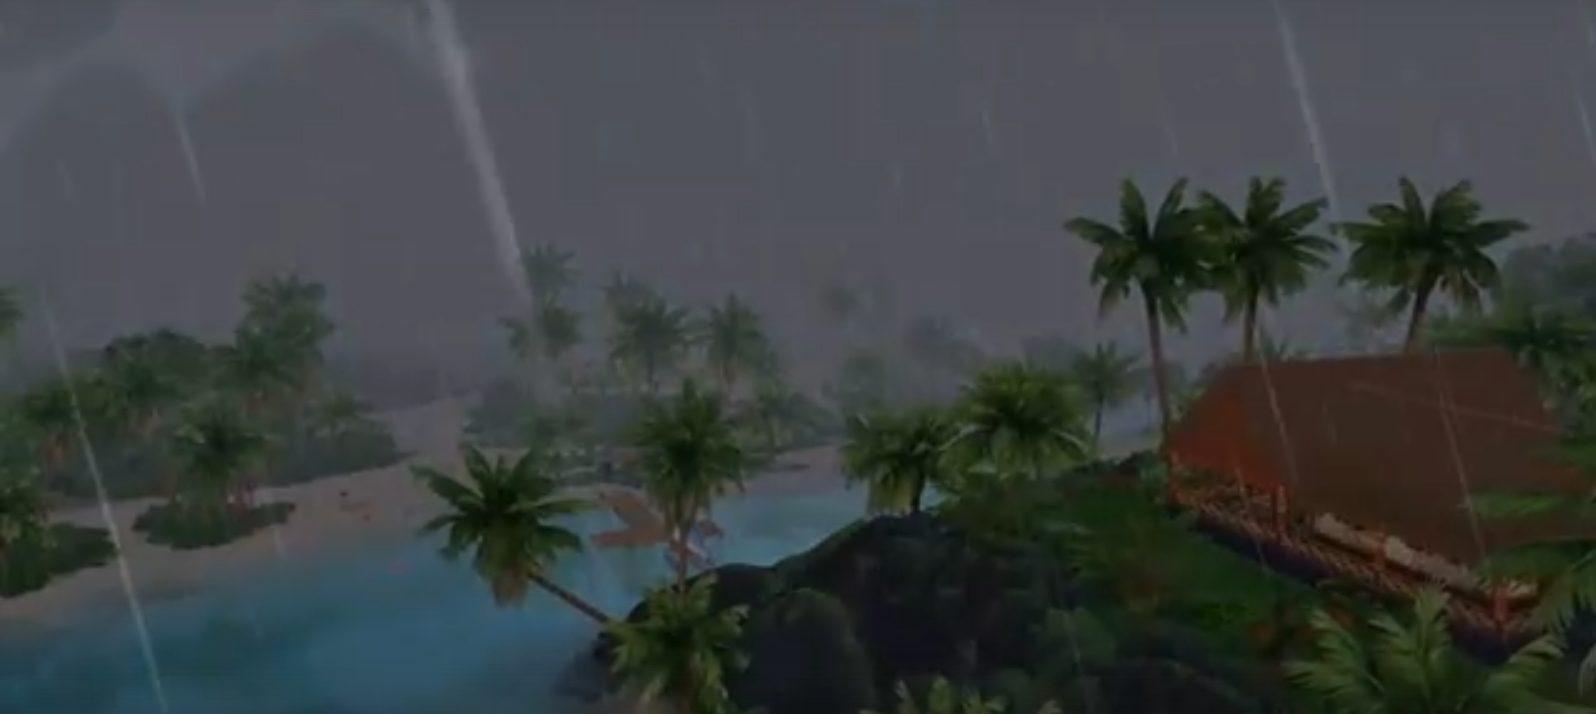 The Sims 4: Жизнь на острове: тропический муссон